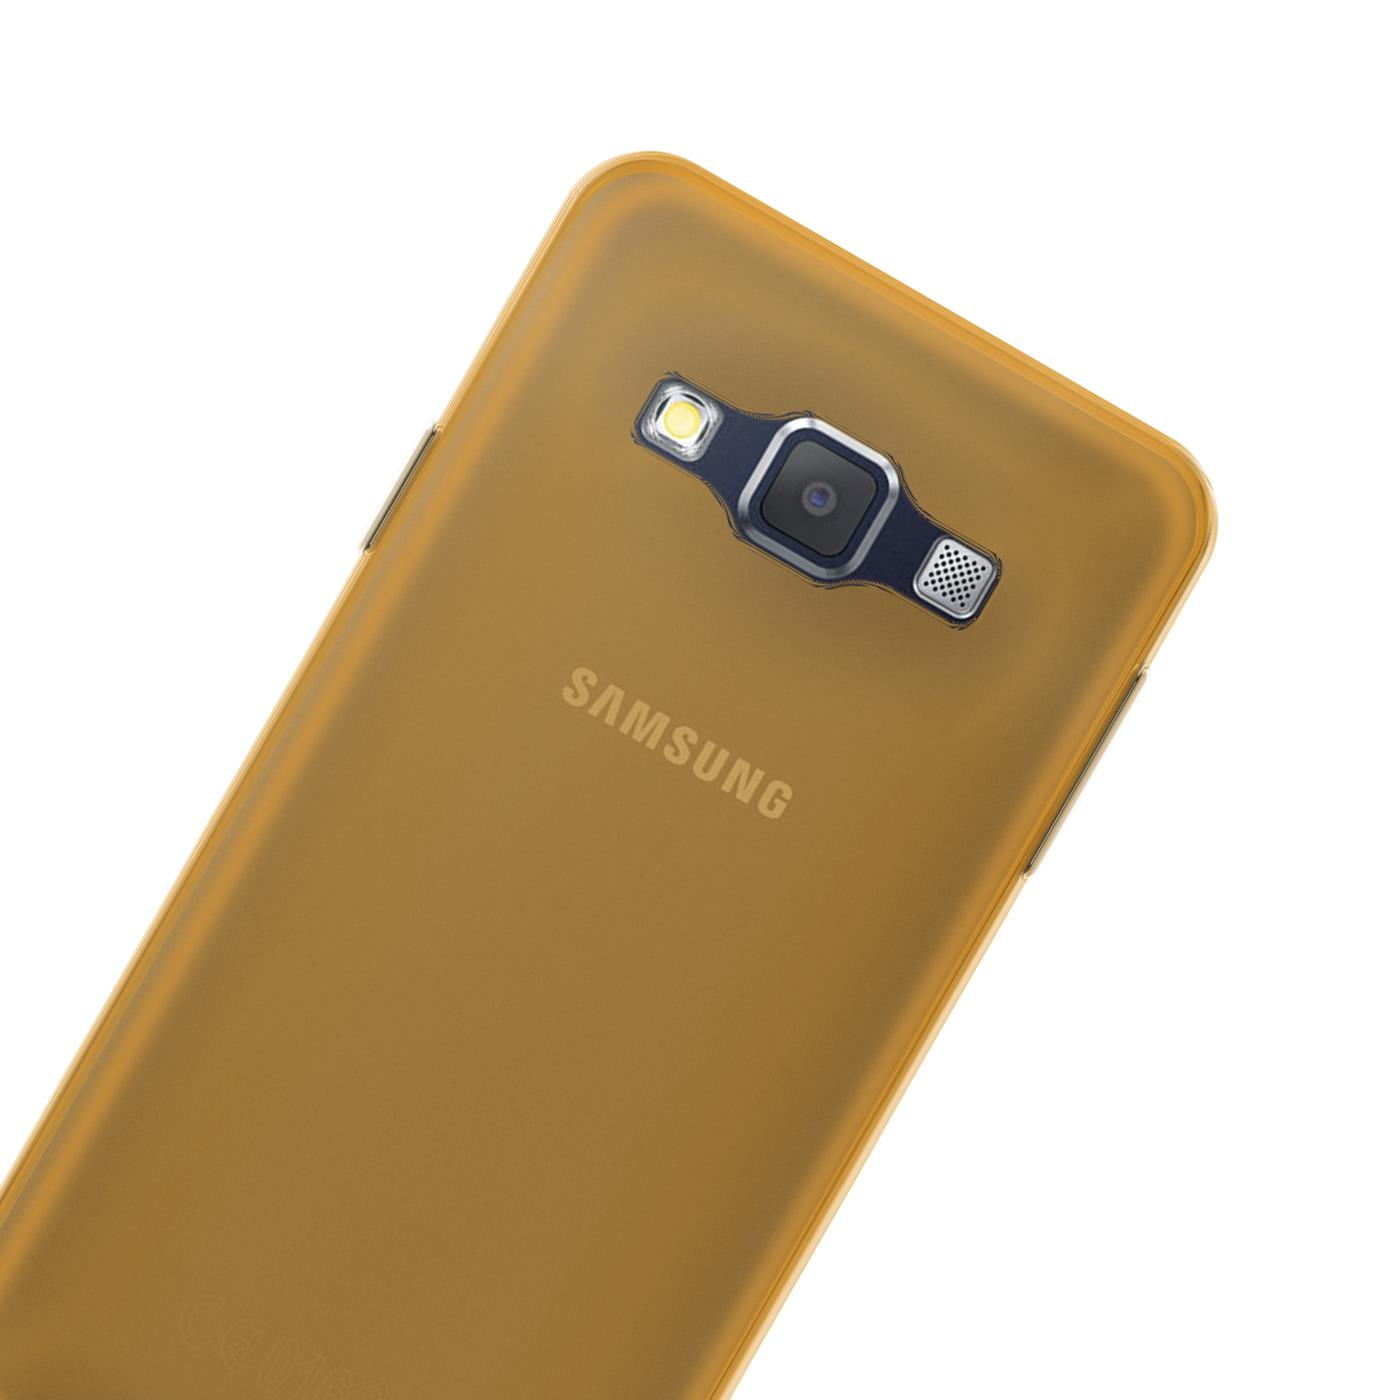 Samsung-Galaxy-A3-2015-Thin-Silicone-Clear-Case-Cover-Ultra-Slim-Shockproof-Gel Indexbild 16